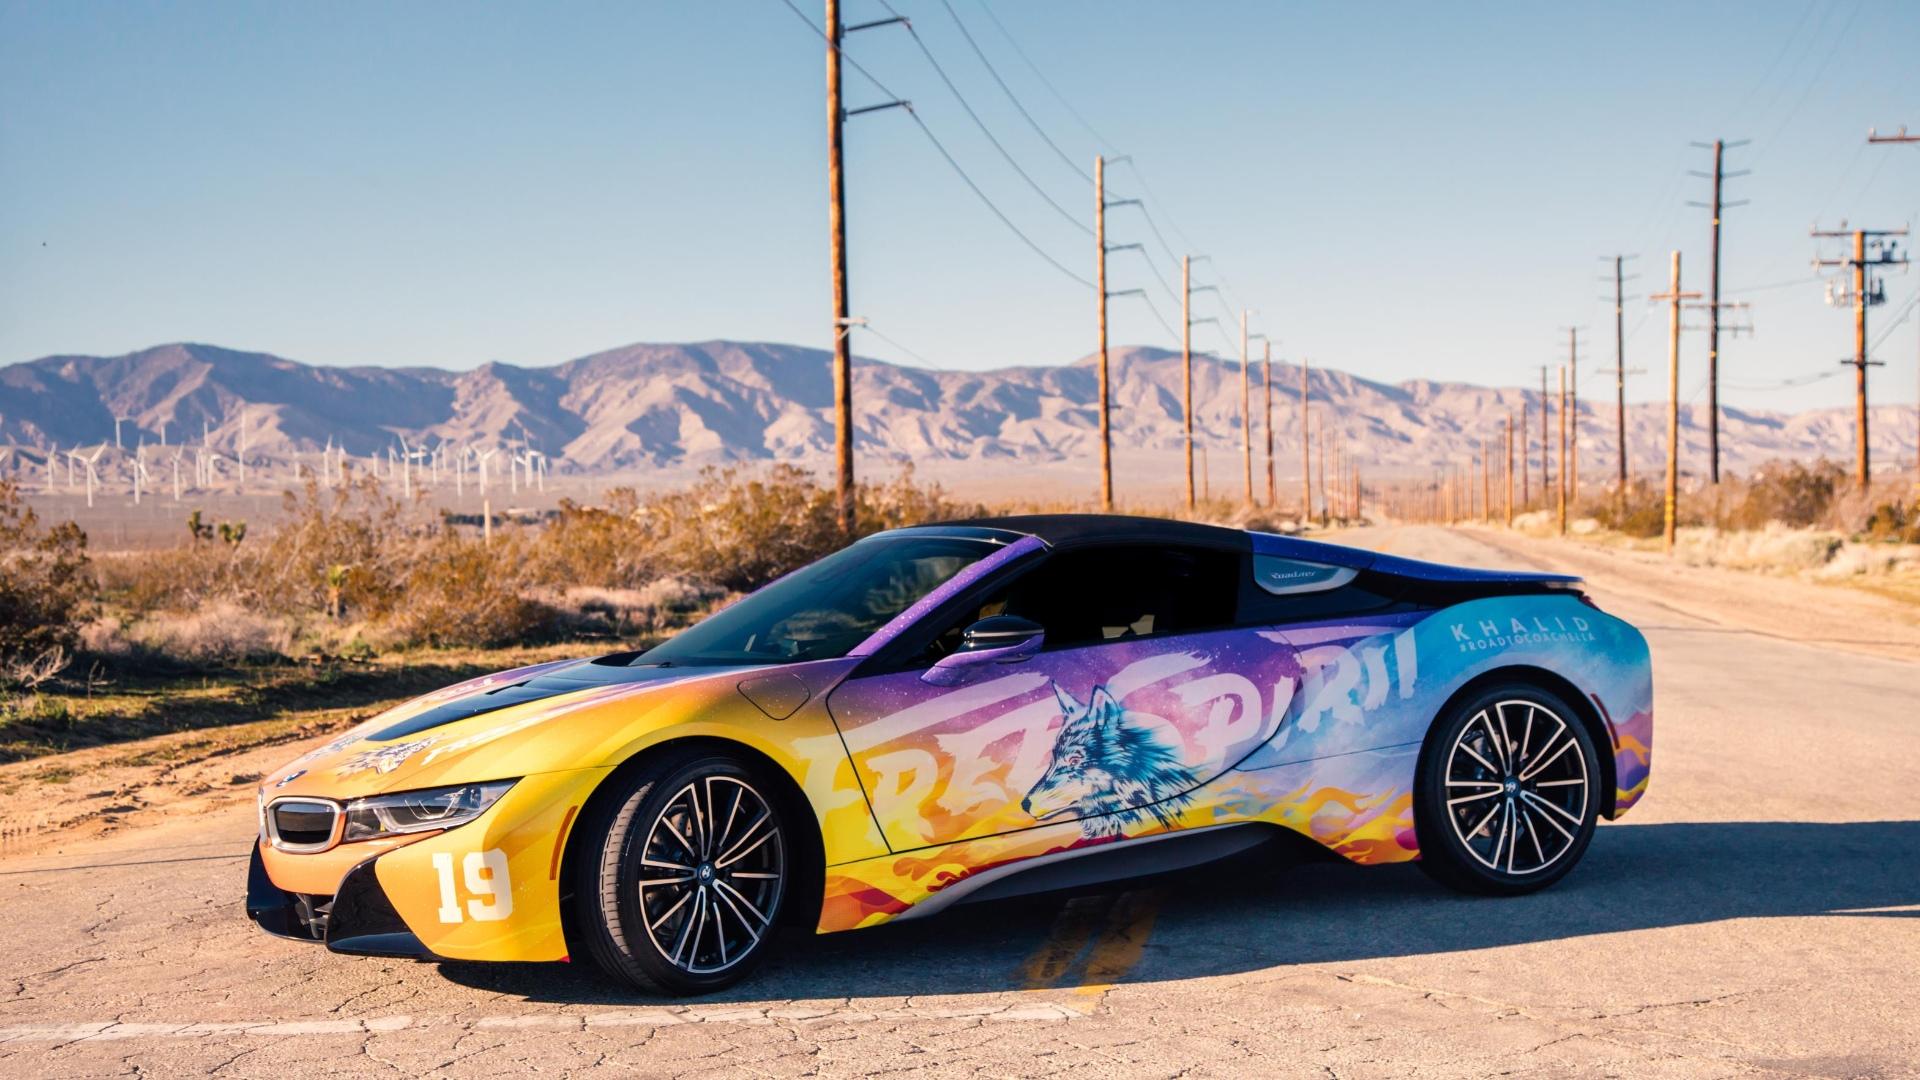 BMW Coachella